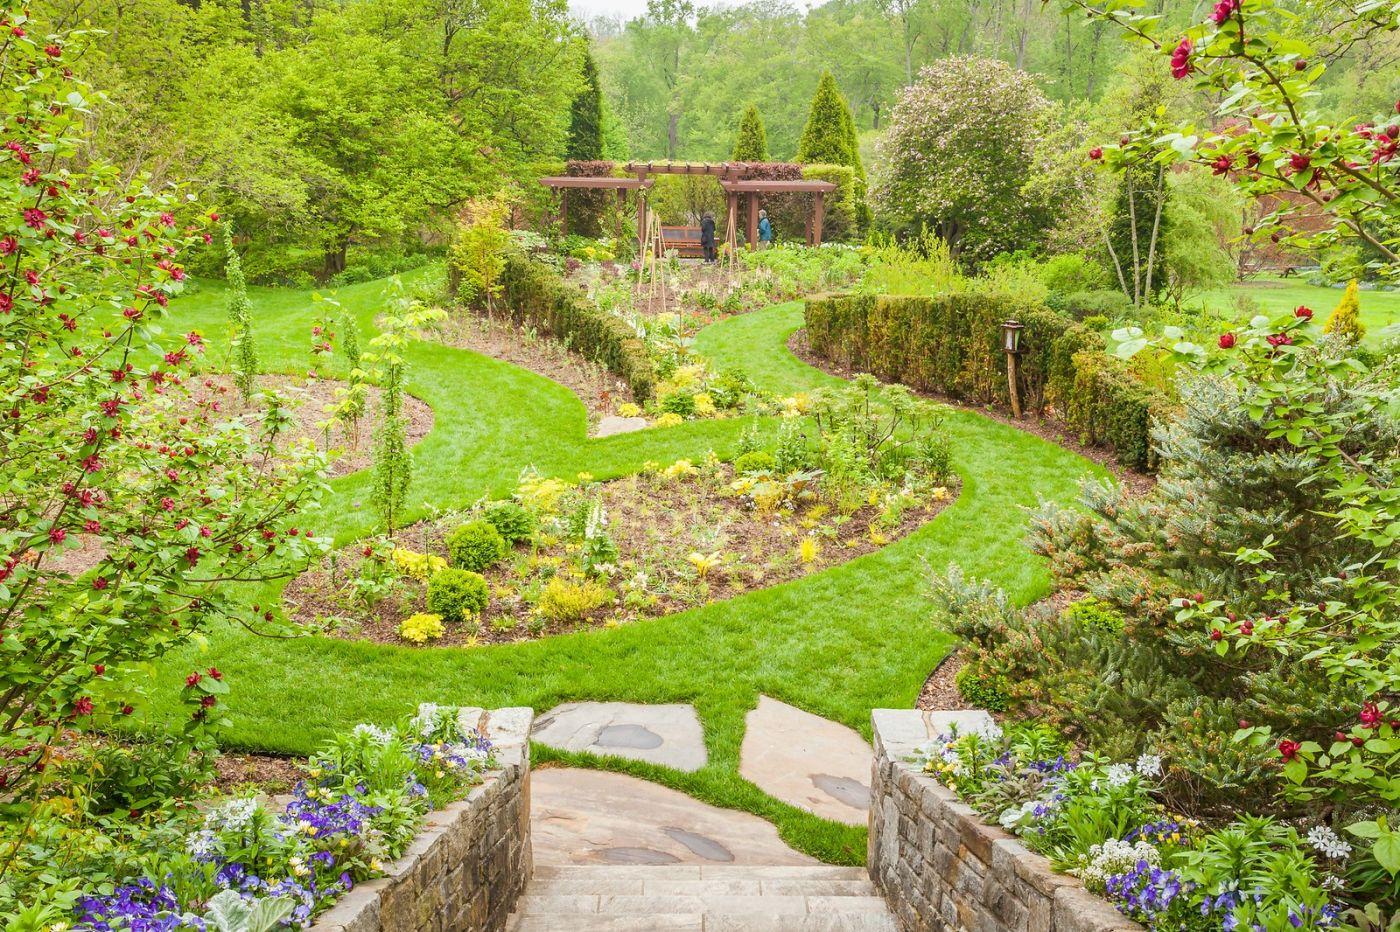 Chanticleer花园,融入自然_图1-6